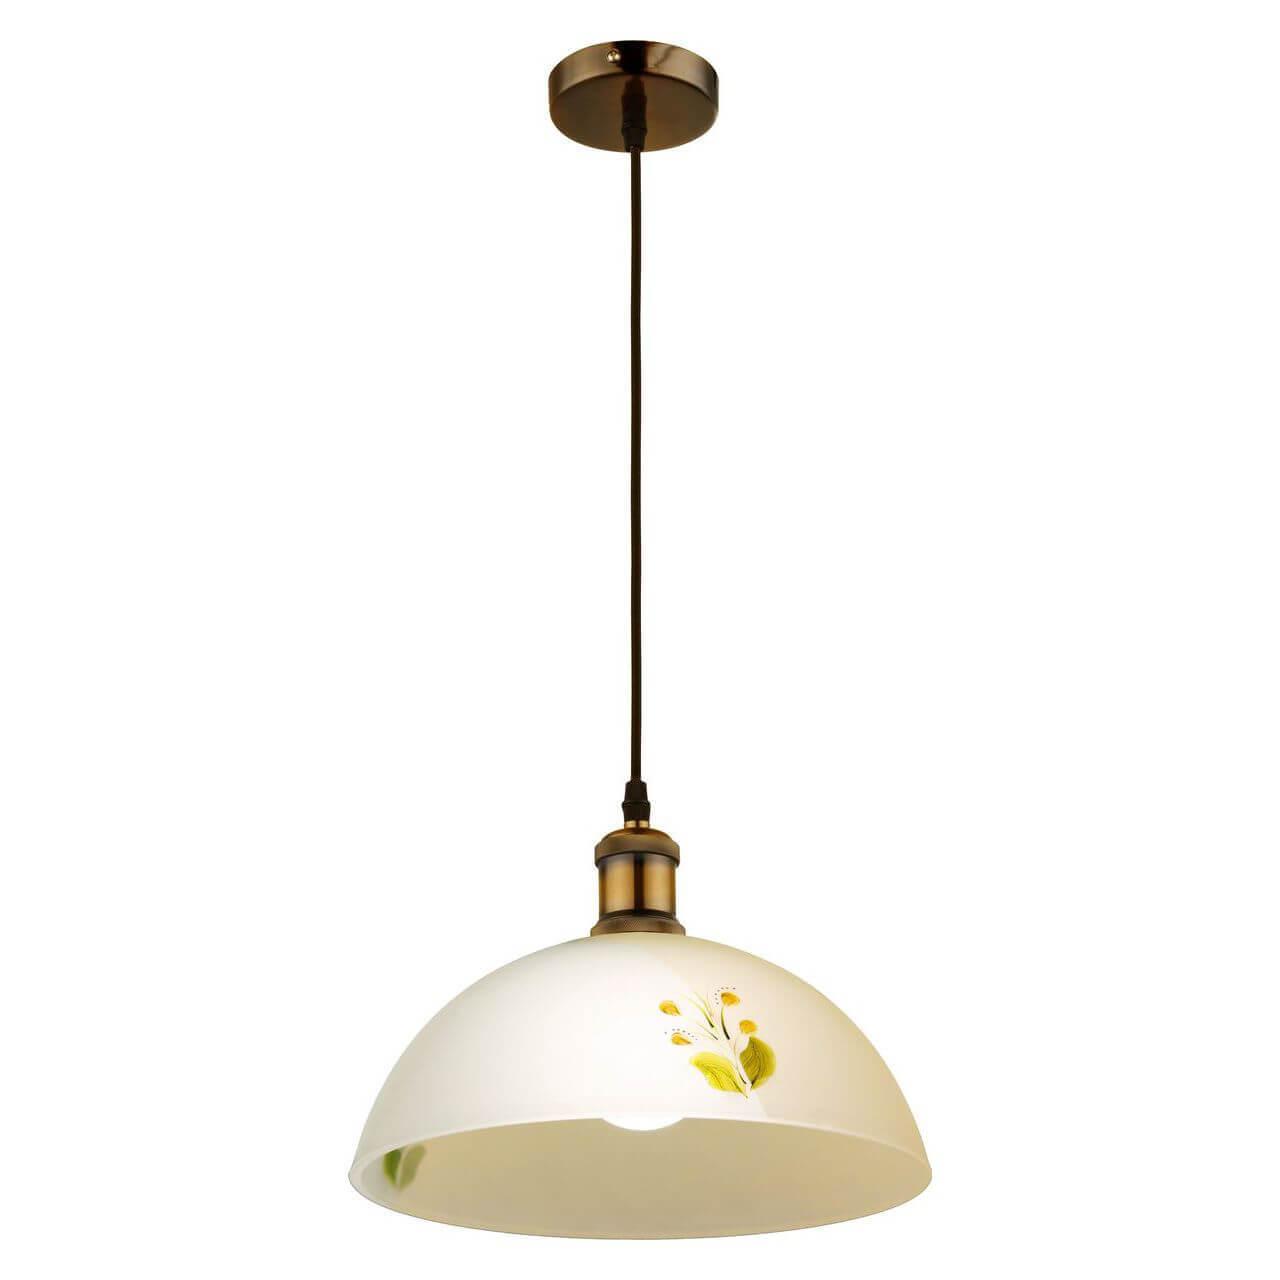 Светильник Globo 15506 Ticco подвесной светильник globo new 6905 3 бронза